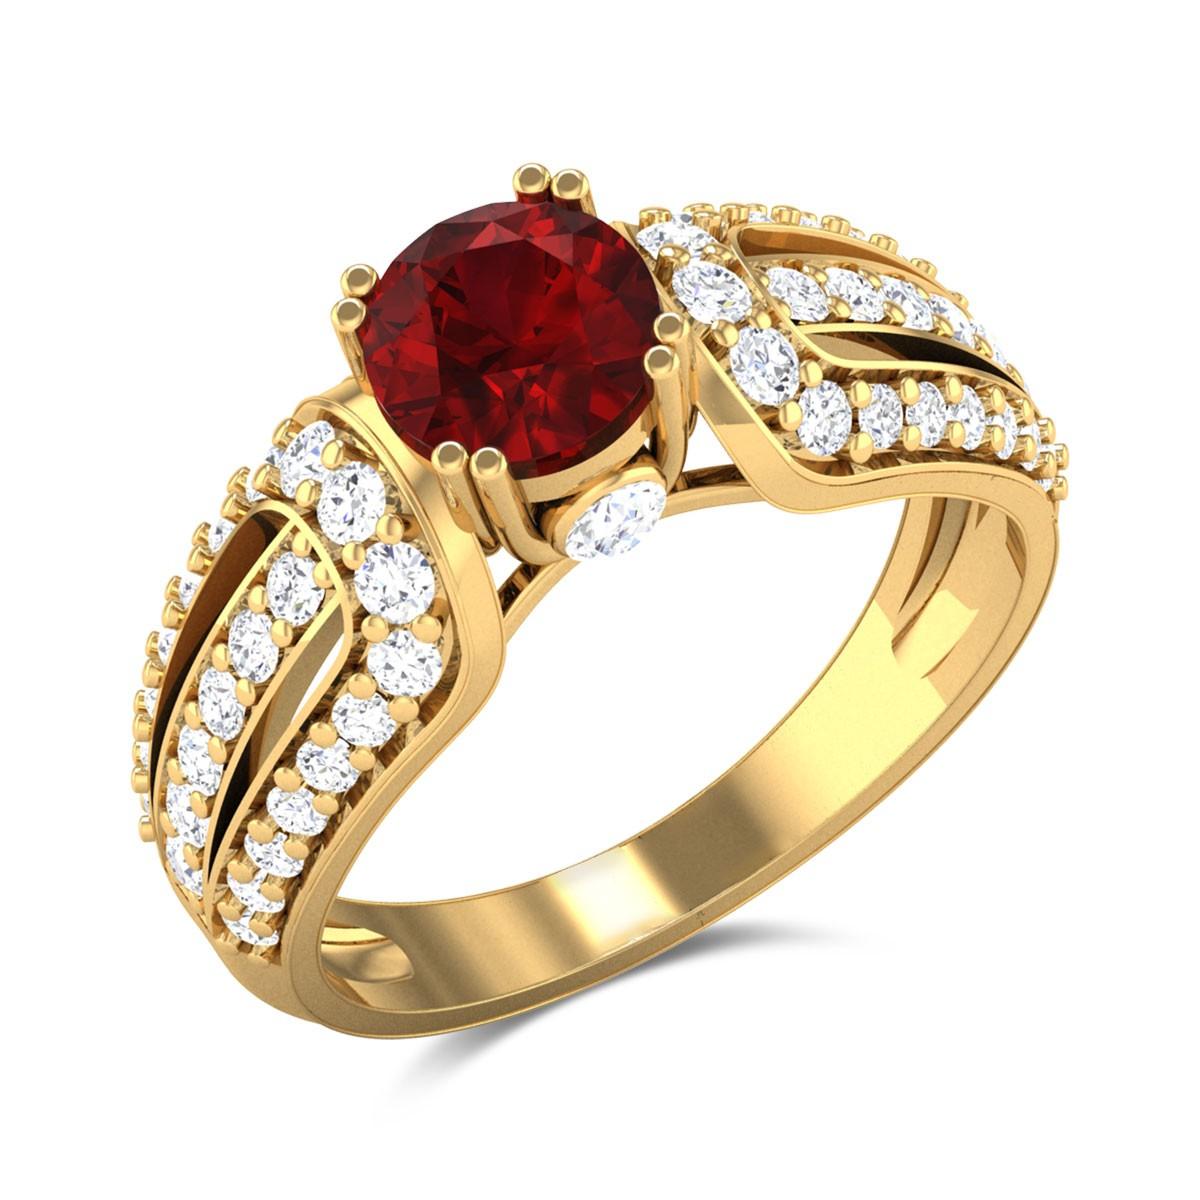 Baha Diamond and Ruby Ring